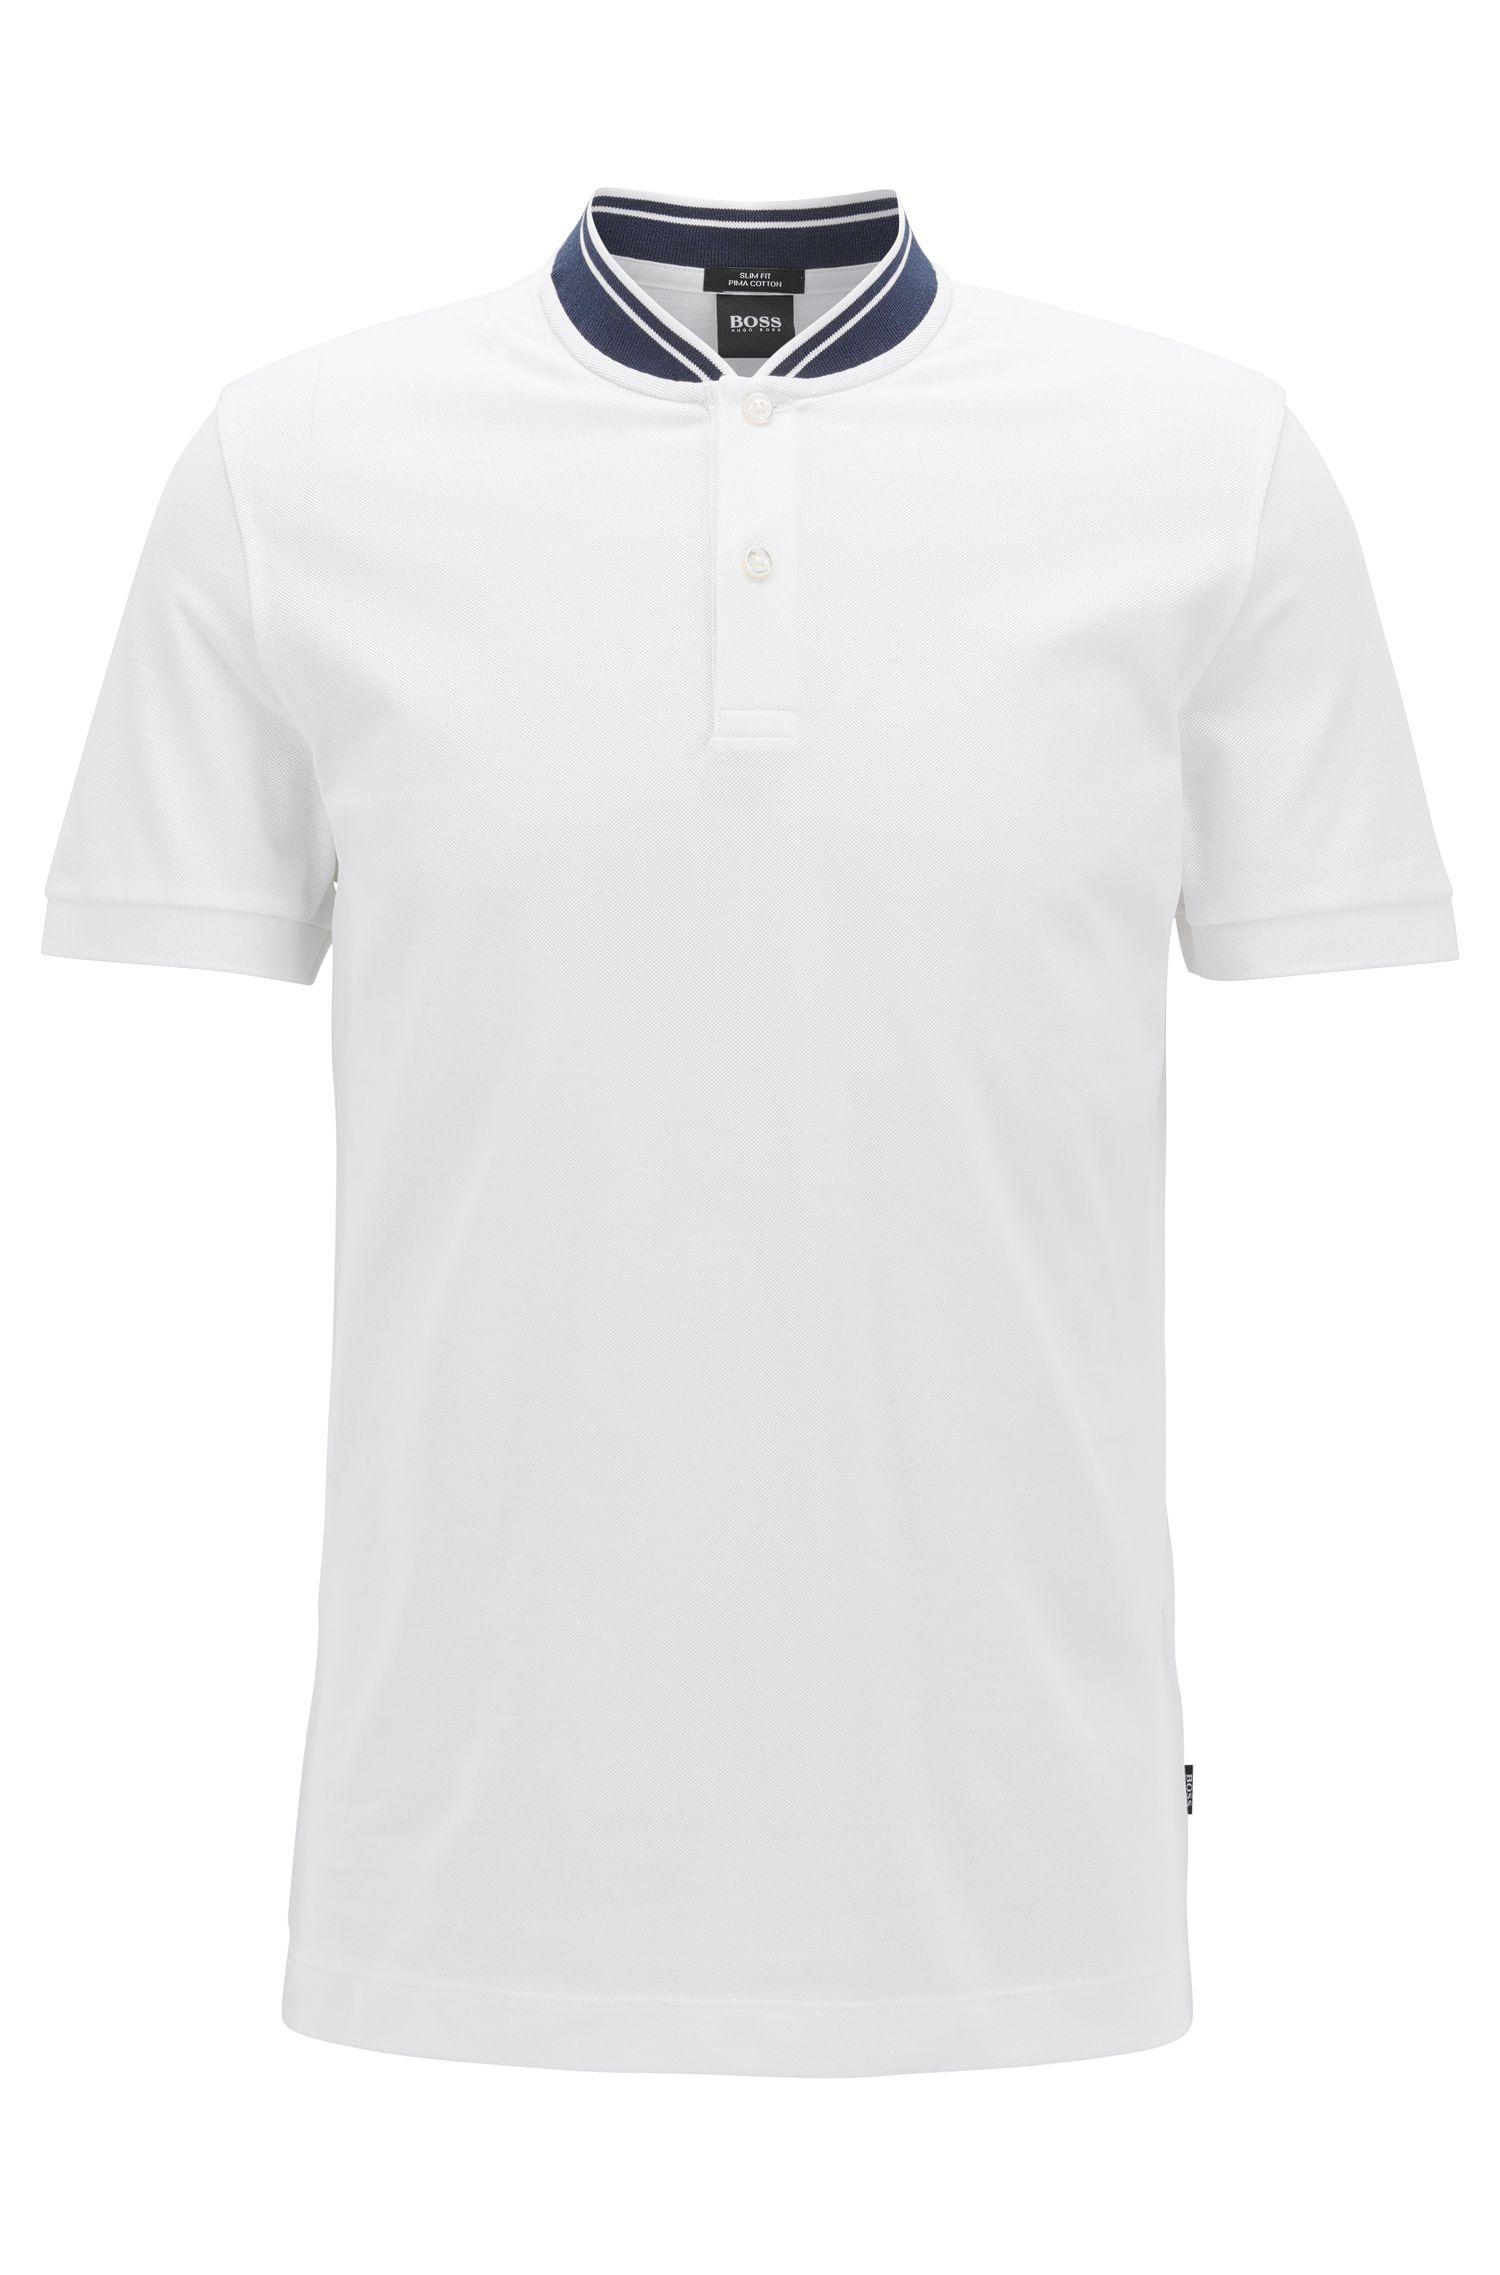 Piqué-cotton Henley shirt in a slim fit